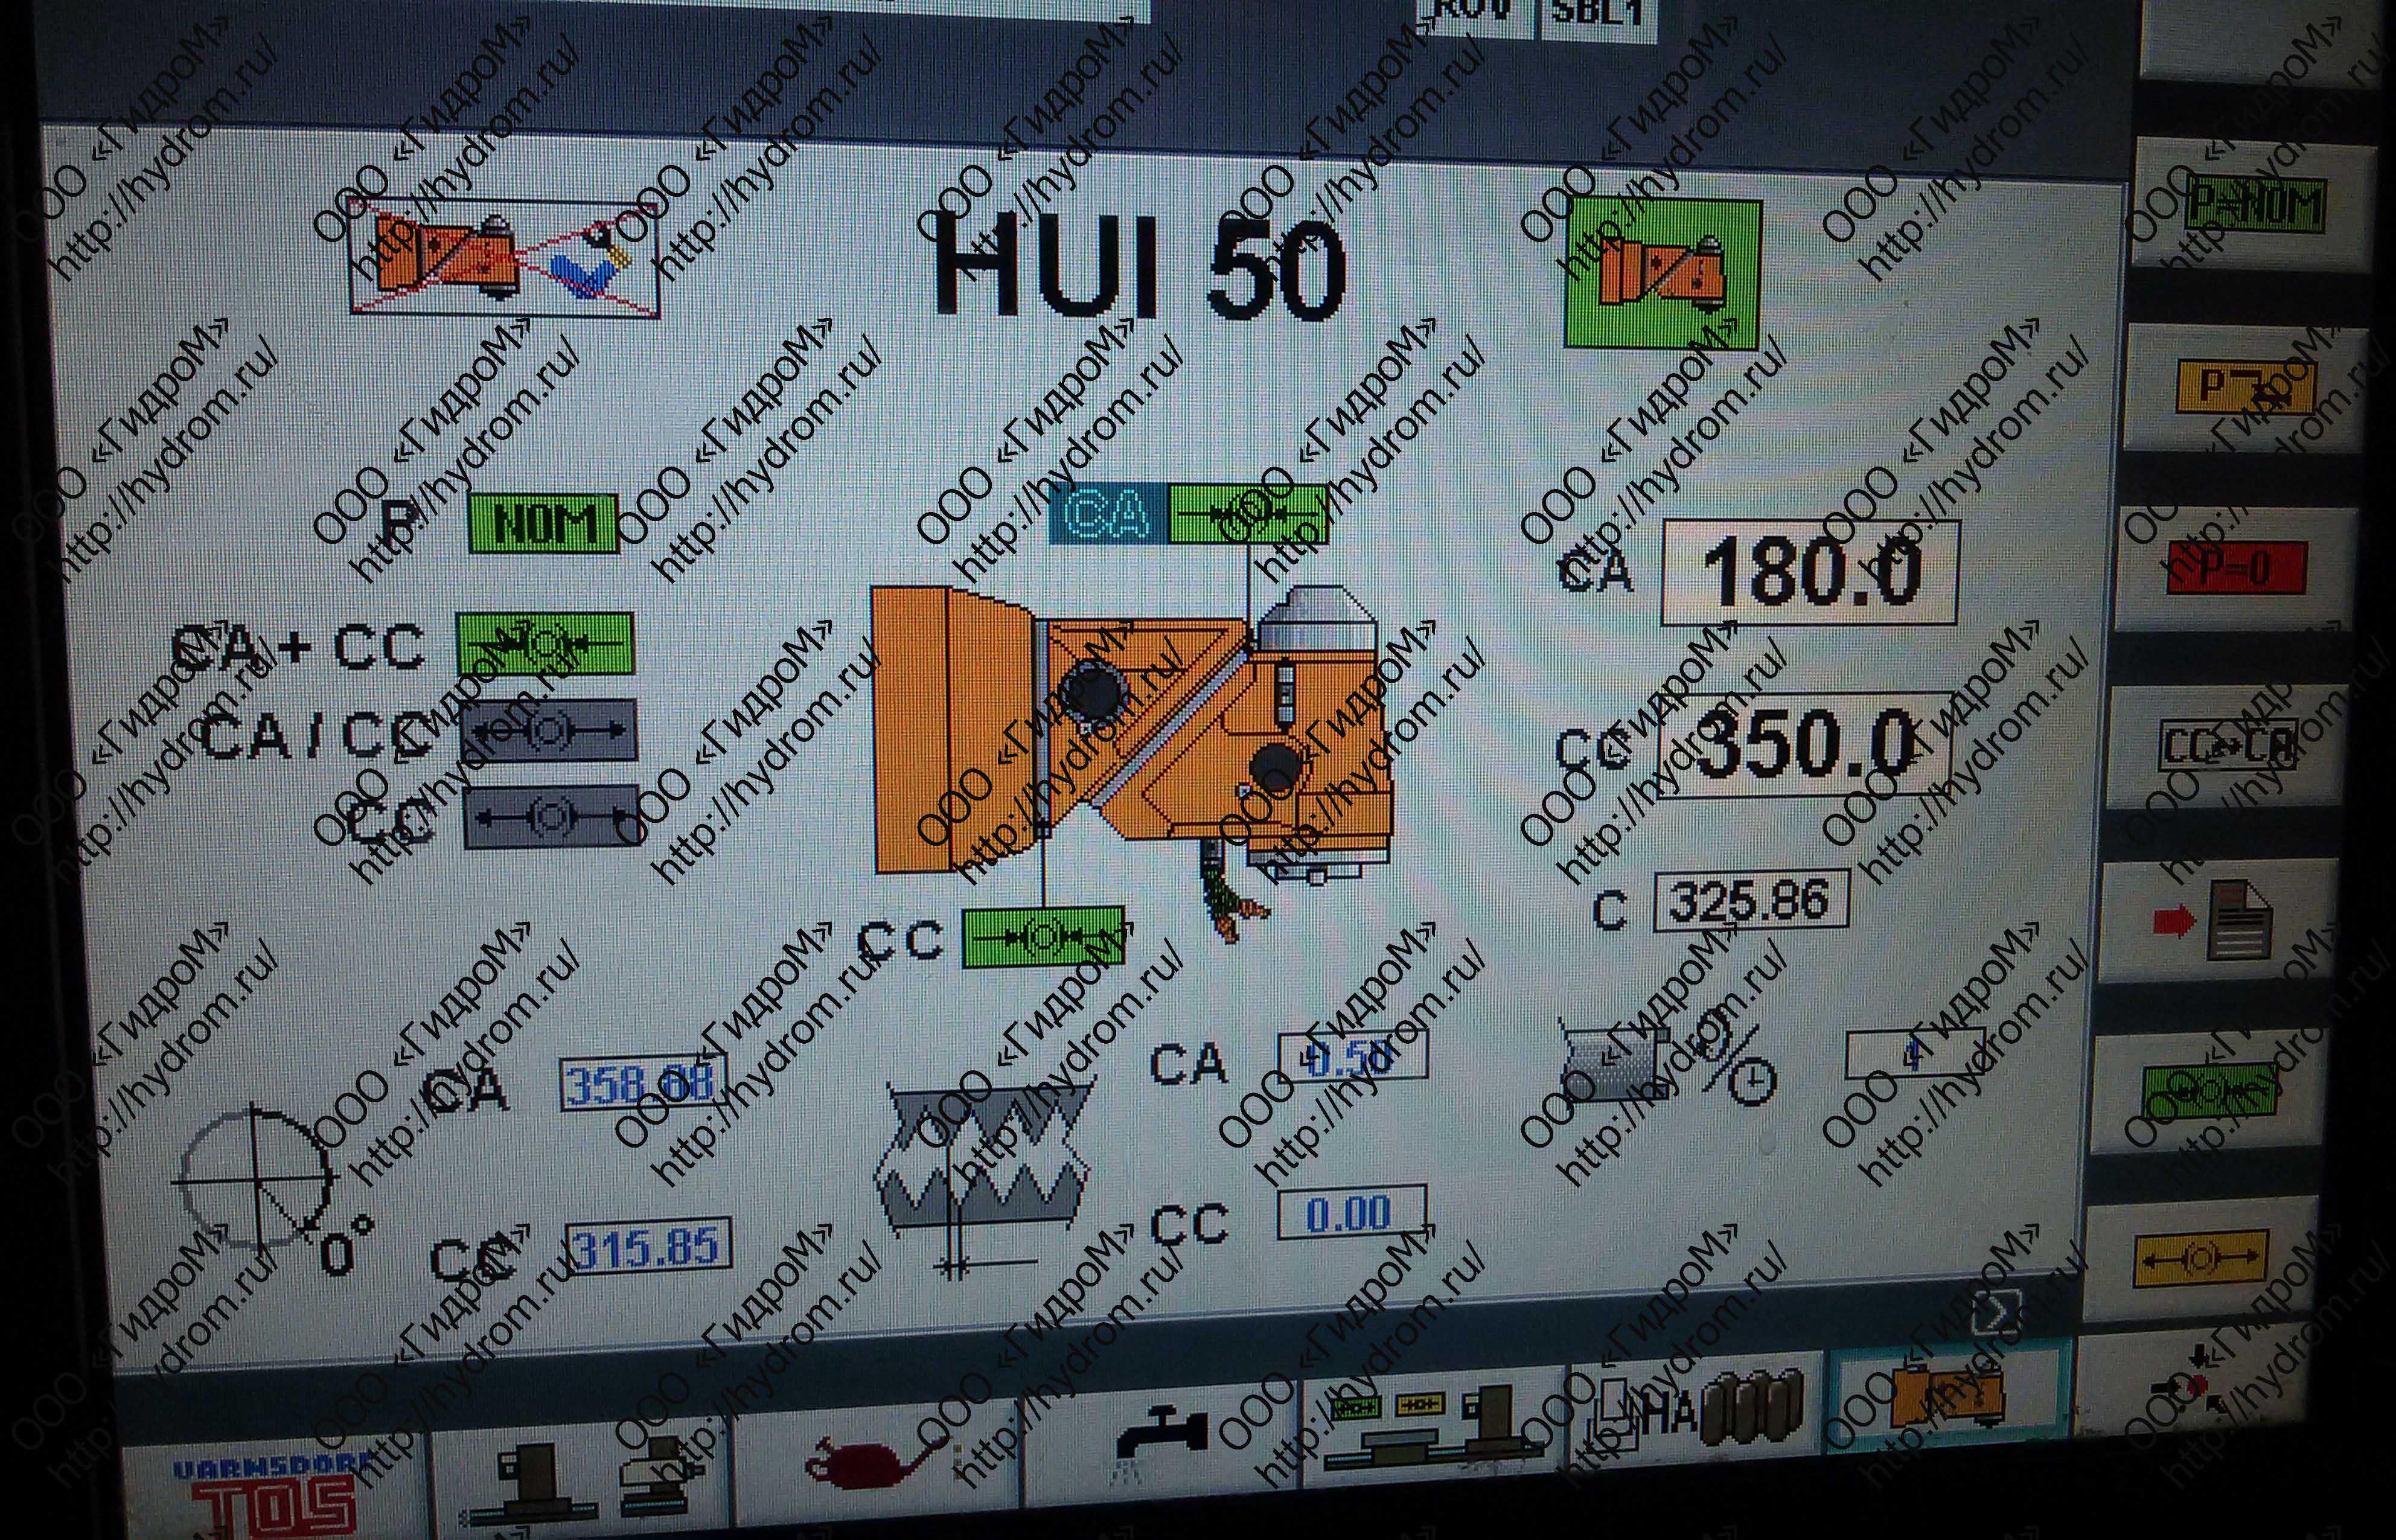 Настройка параметров HUI50